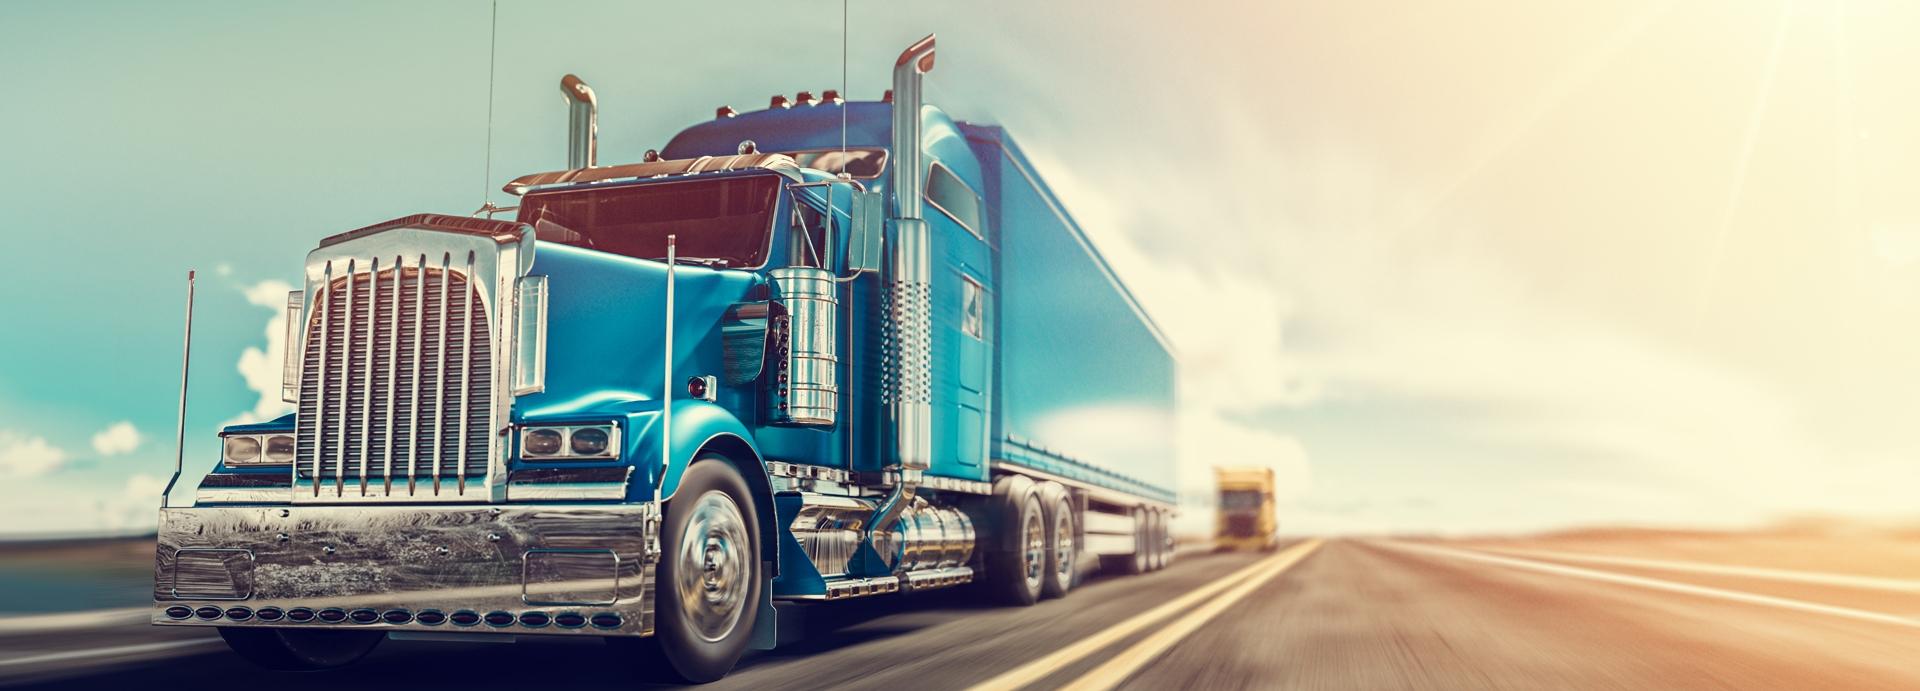 Das A Z der Fahrzeugortung 2 - Das A-Z der Fahrzeugortung | Easytrack GPS-Ortungssysteme